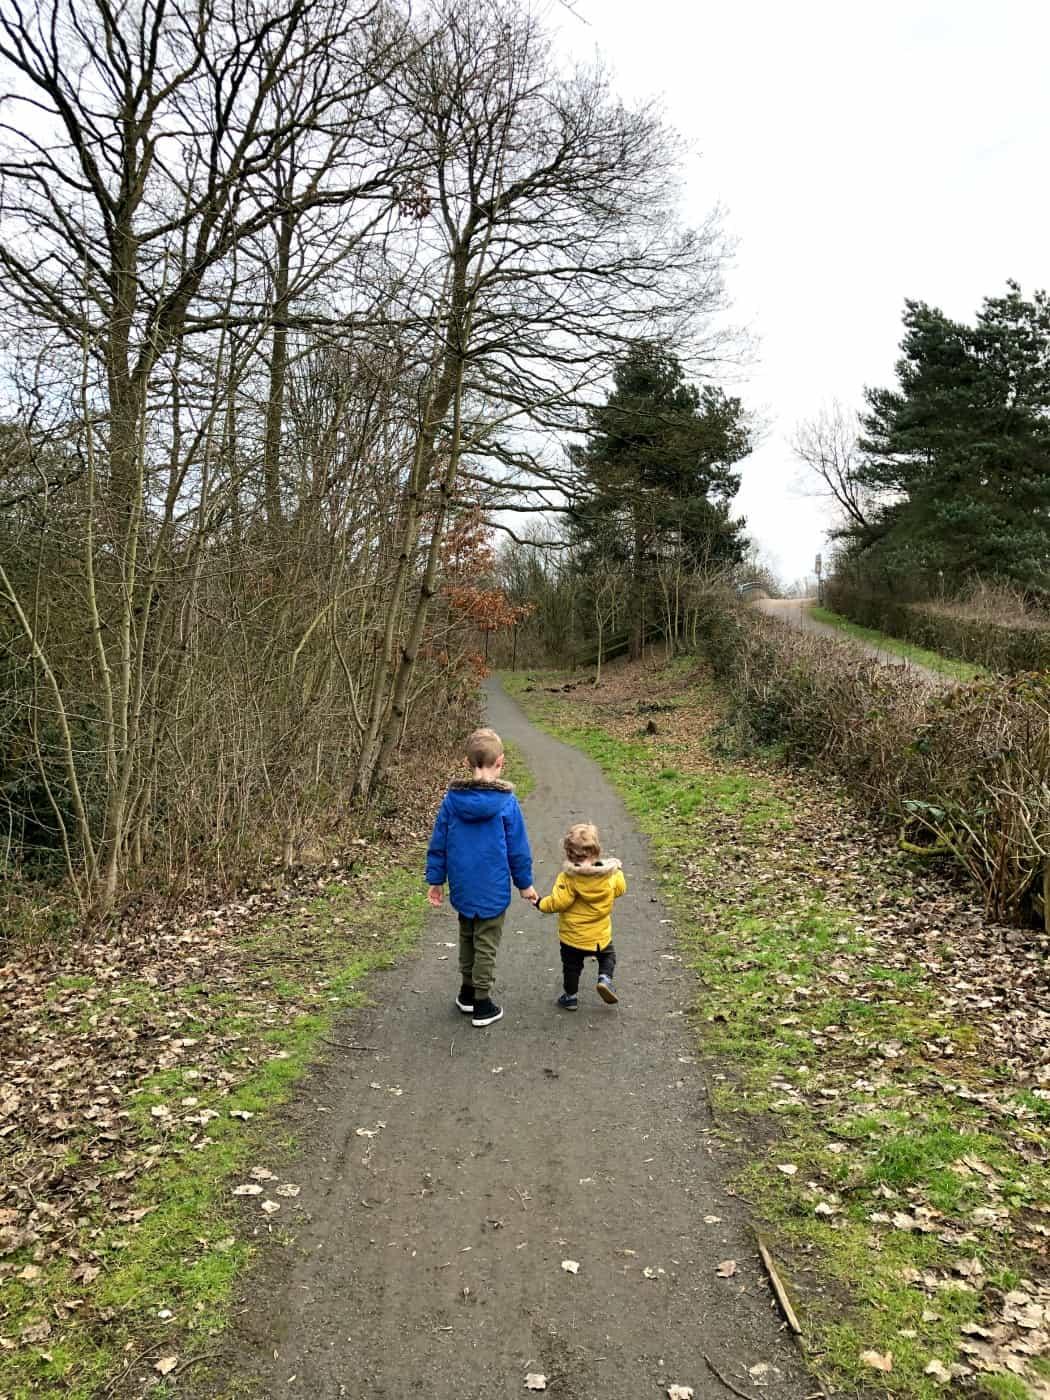 Olly and Freddie February 2019